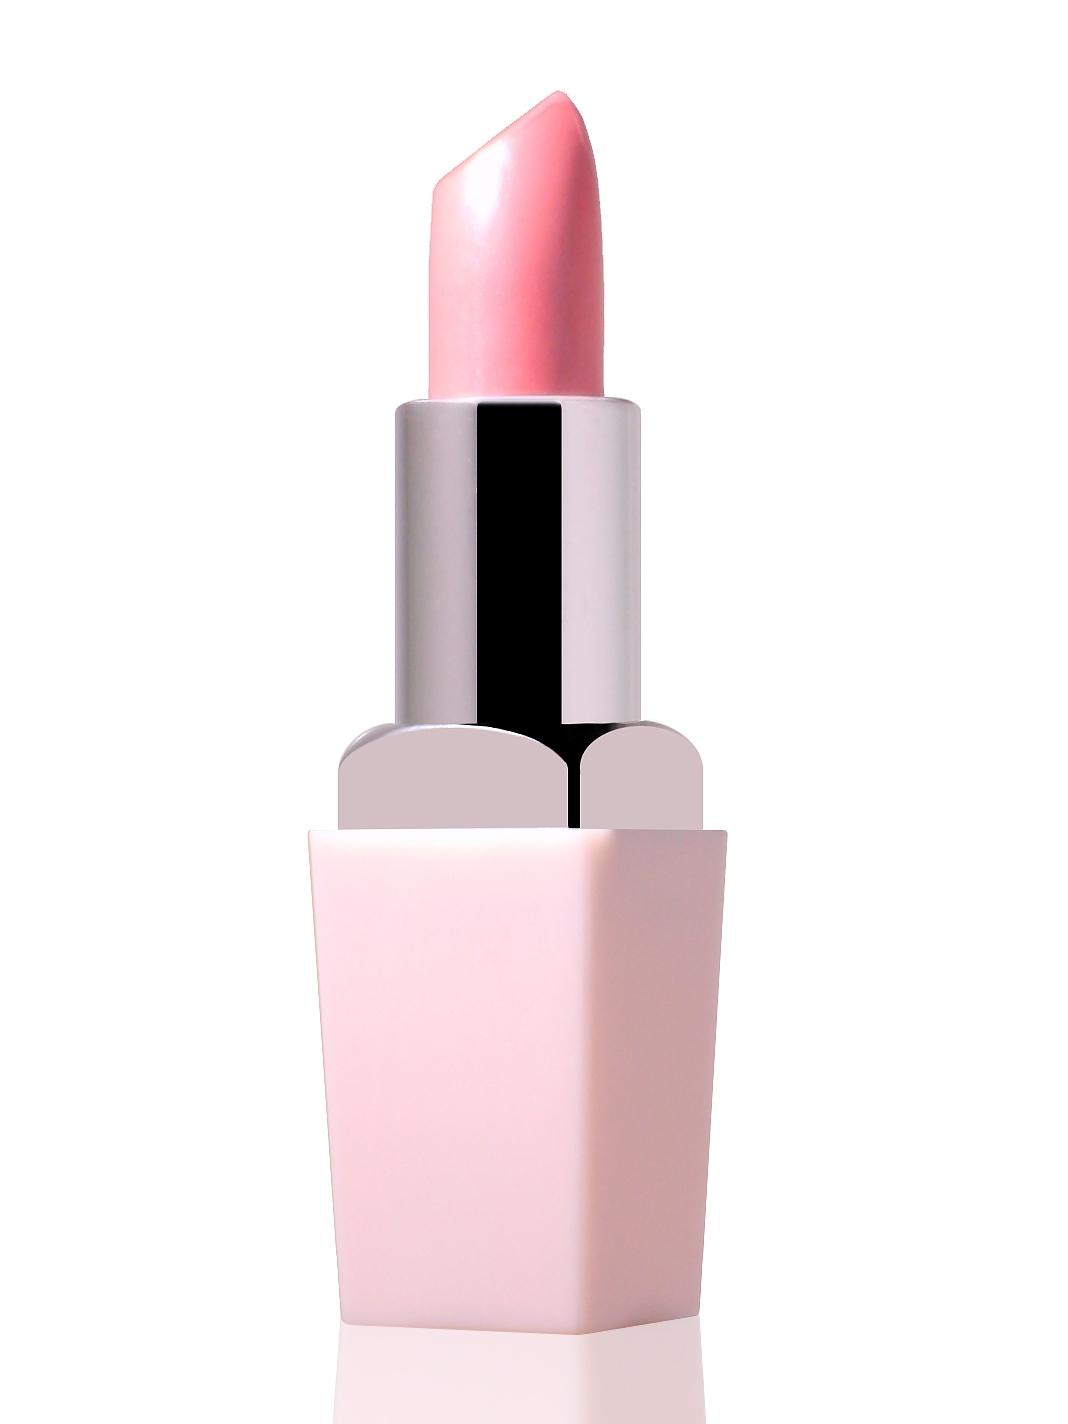 ora yen: Lipstick Cosmetic Wallpapers.